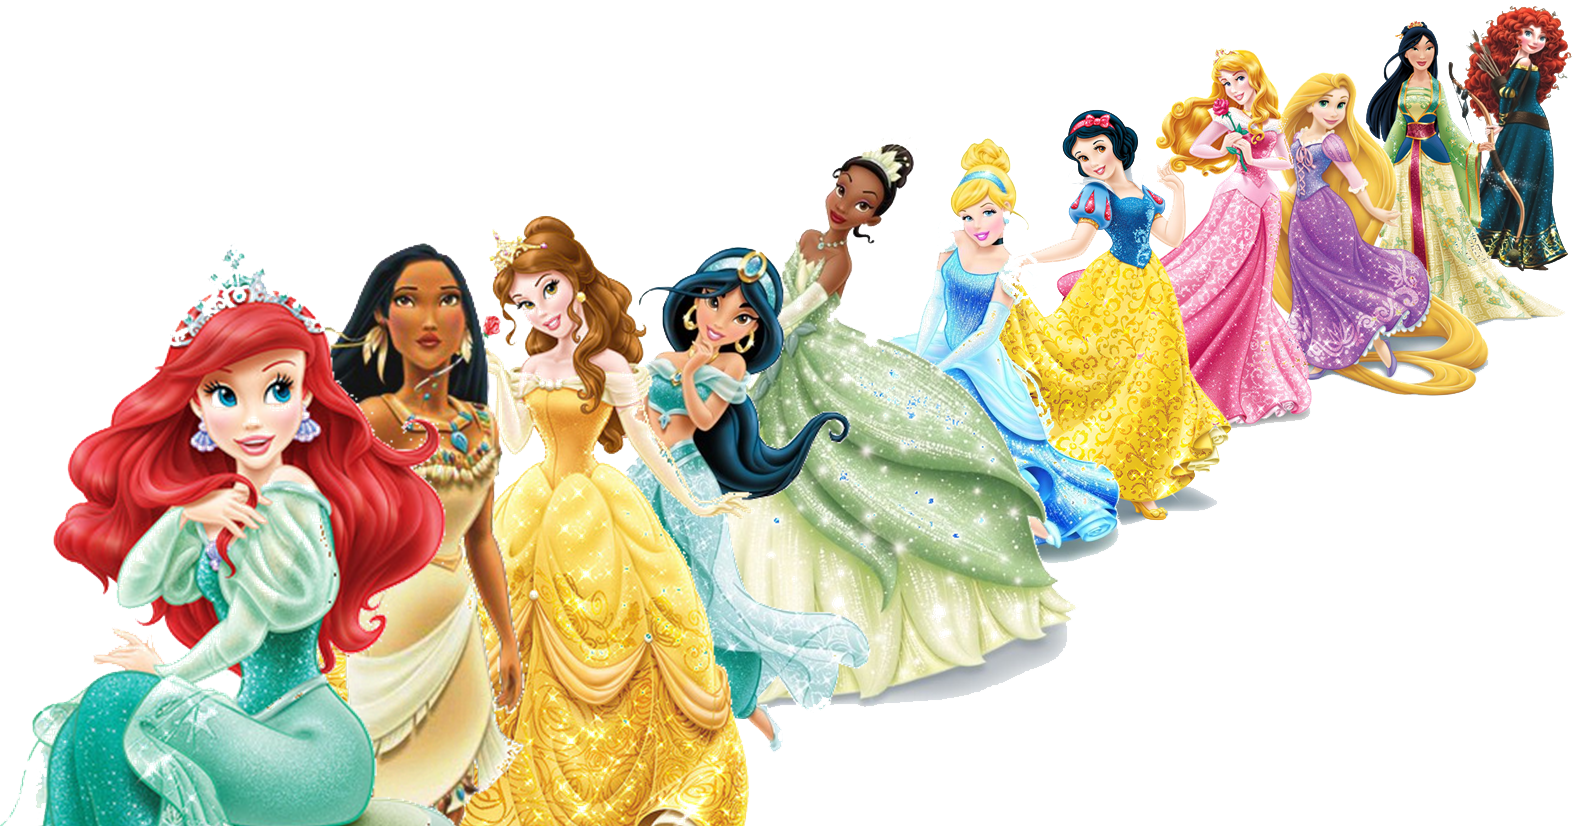 Download Disney Princesses Png Images Transparent Gallery. Advertisement - Disney Princesses, Transparent background PNG HD thumbnail